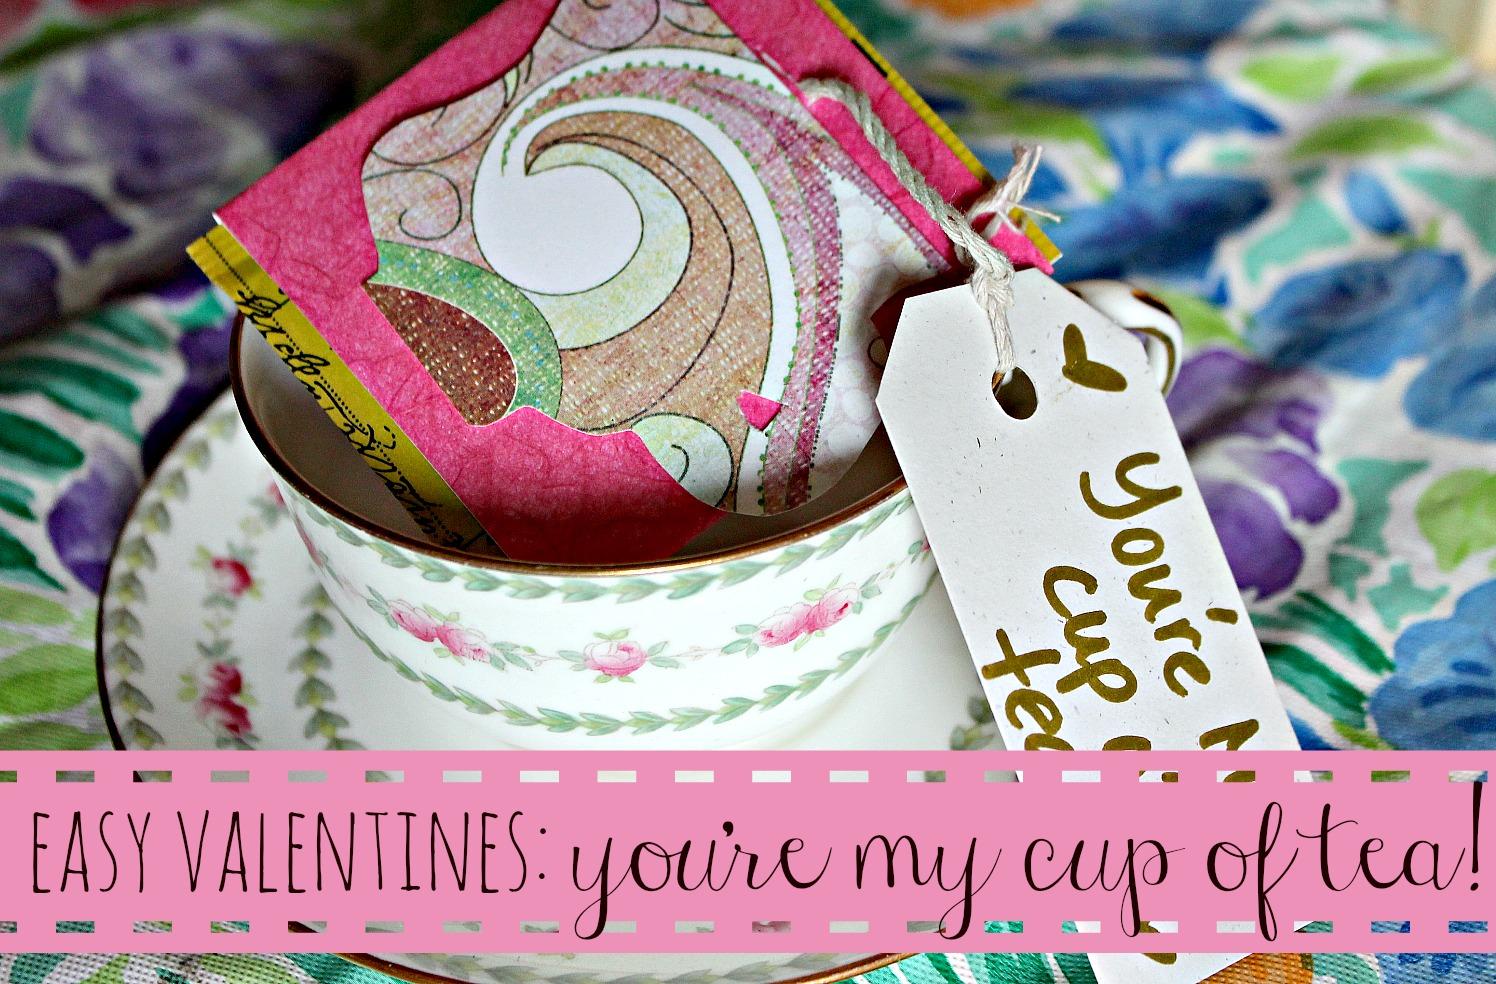 easy valentine 39 s diy you 39 re my cup of tea. Black Bedroom Furniture Sets. Home Design Ideas